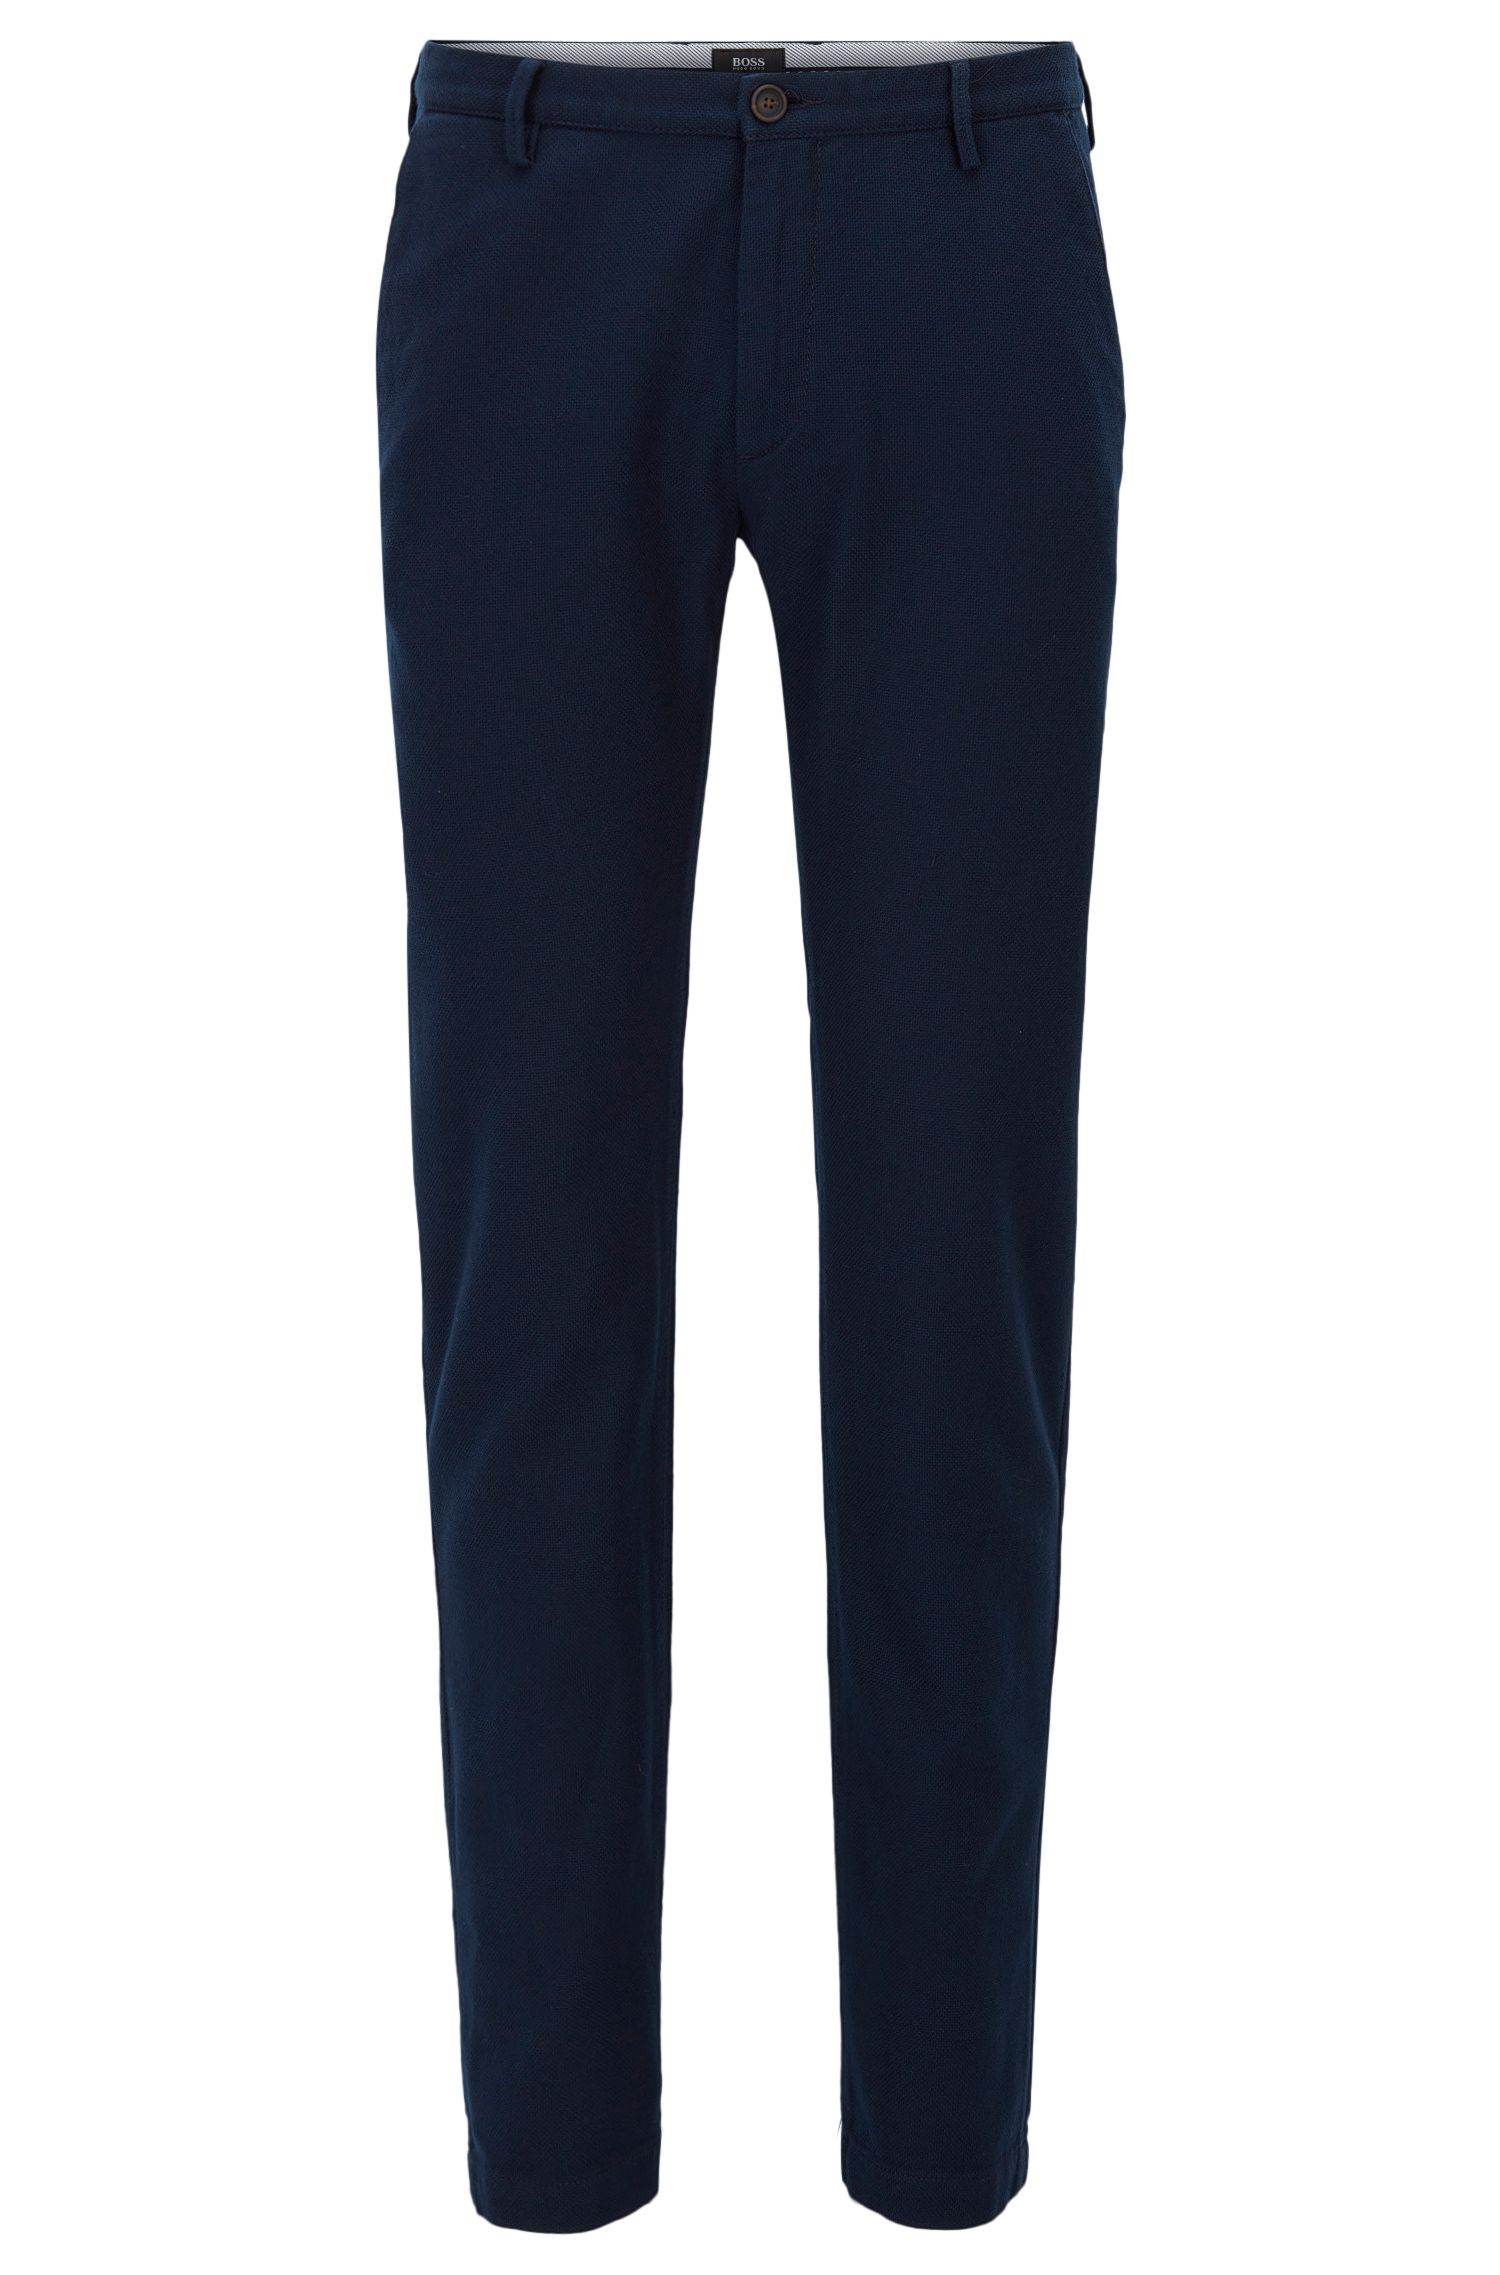 'Rice W' | Slim Fit, Stretch Cotton Chino Pants